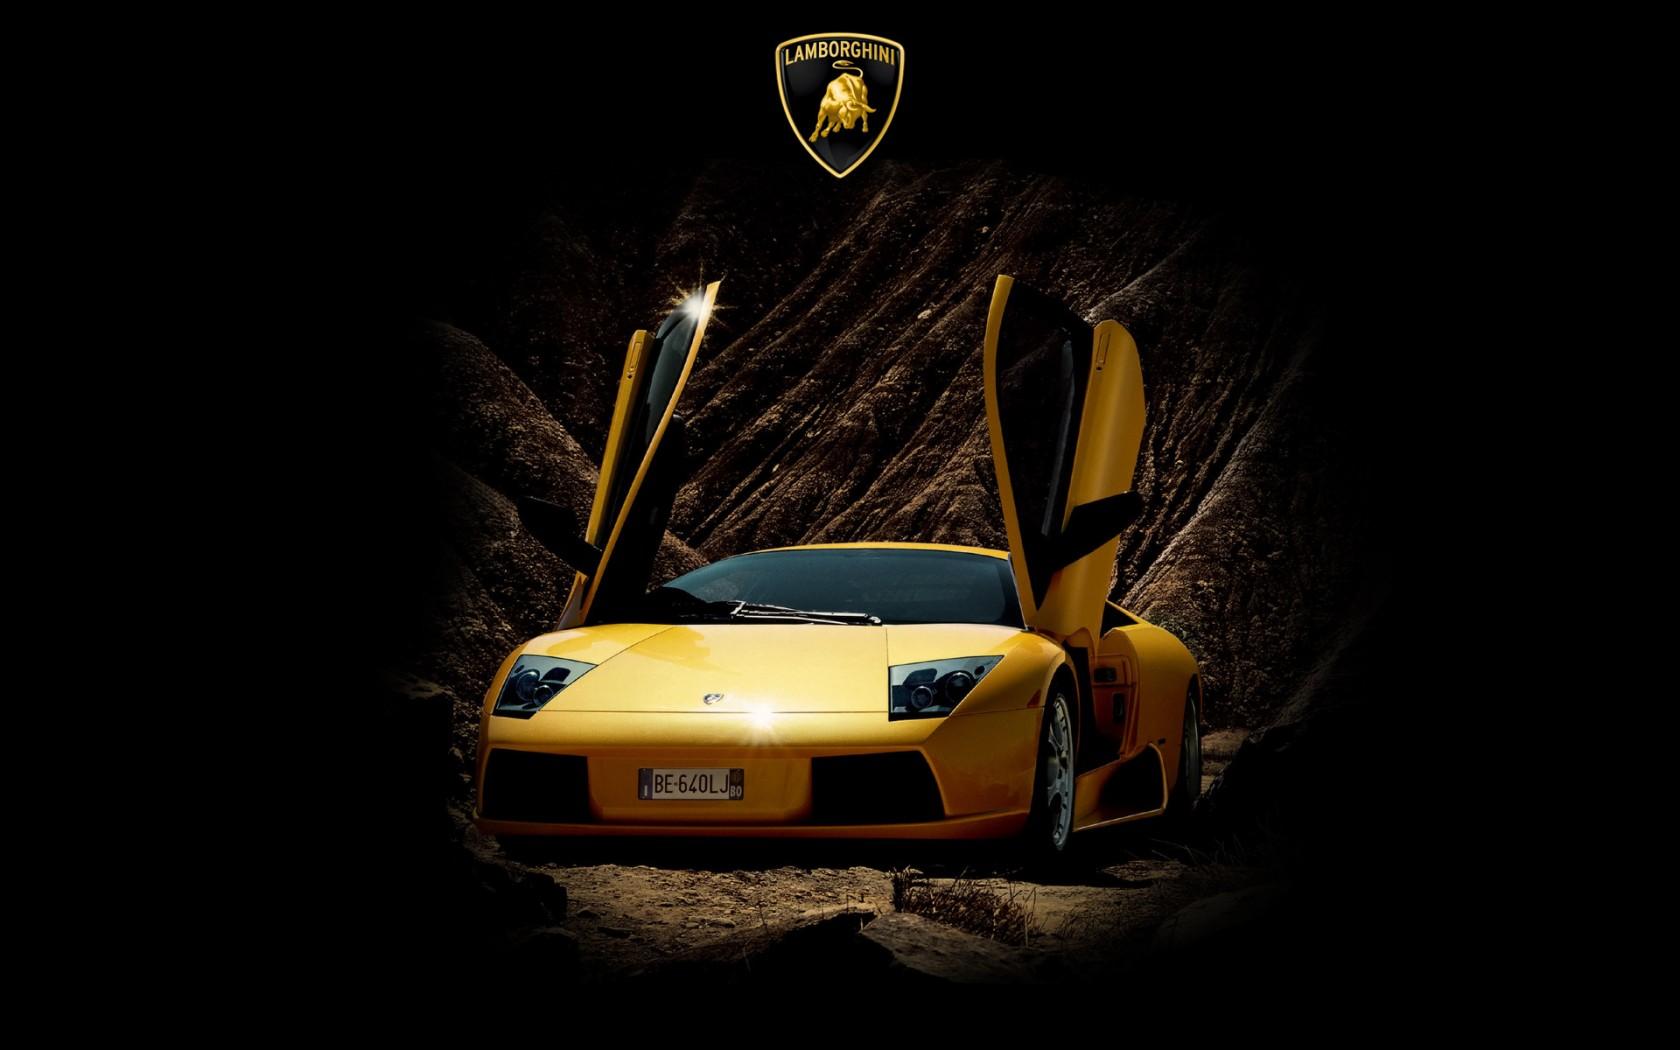 45] Lamborghini Logo Wallpaper HD on WallpaperSafari 1680x1050